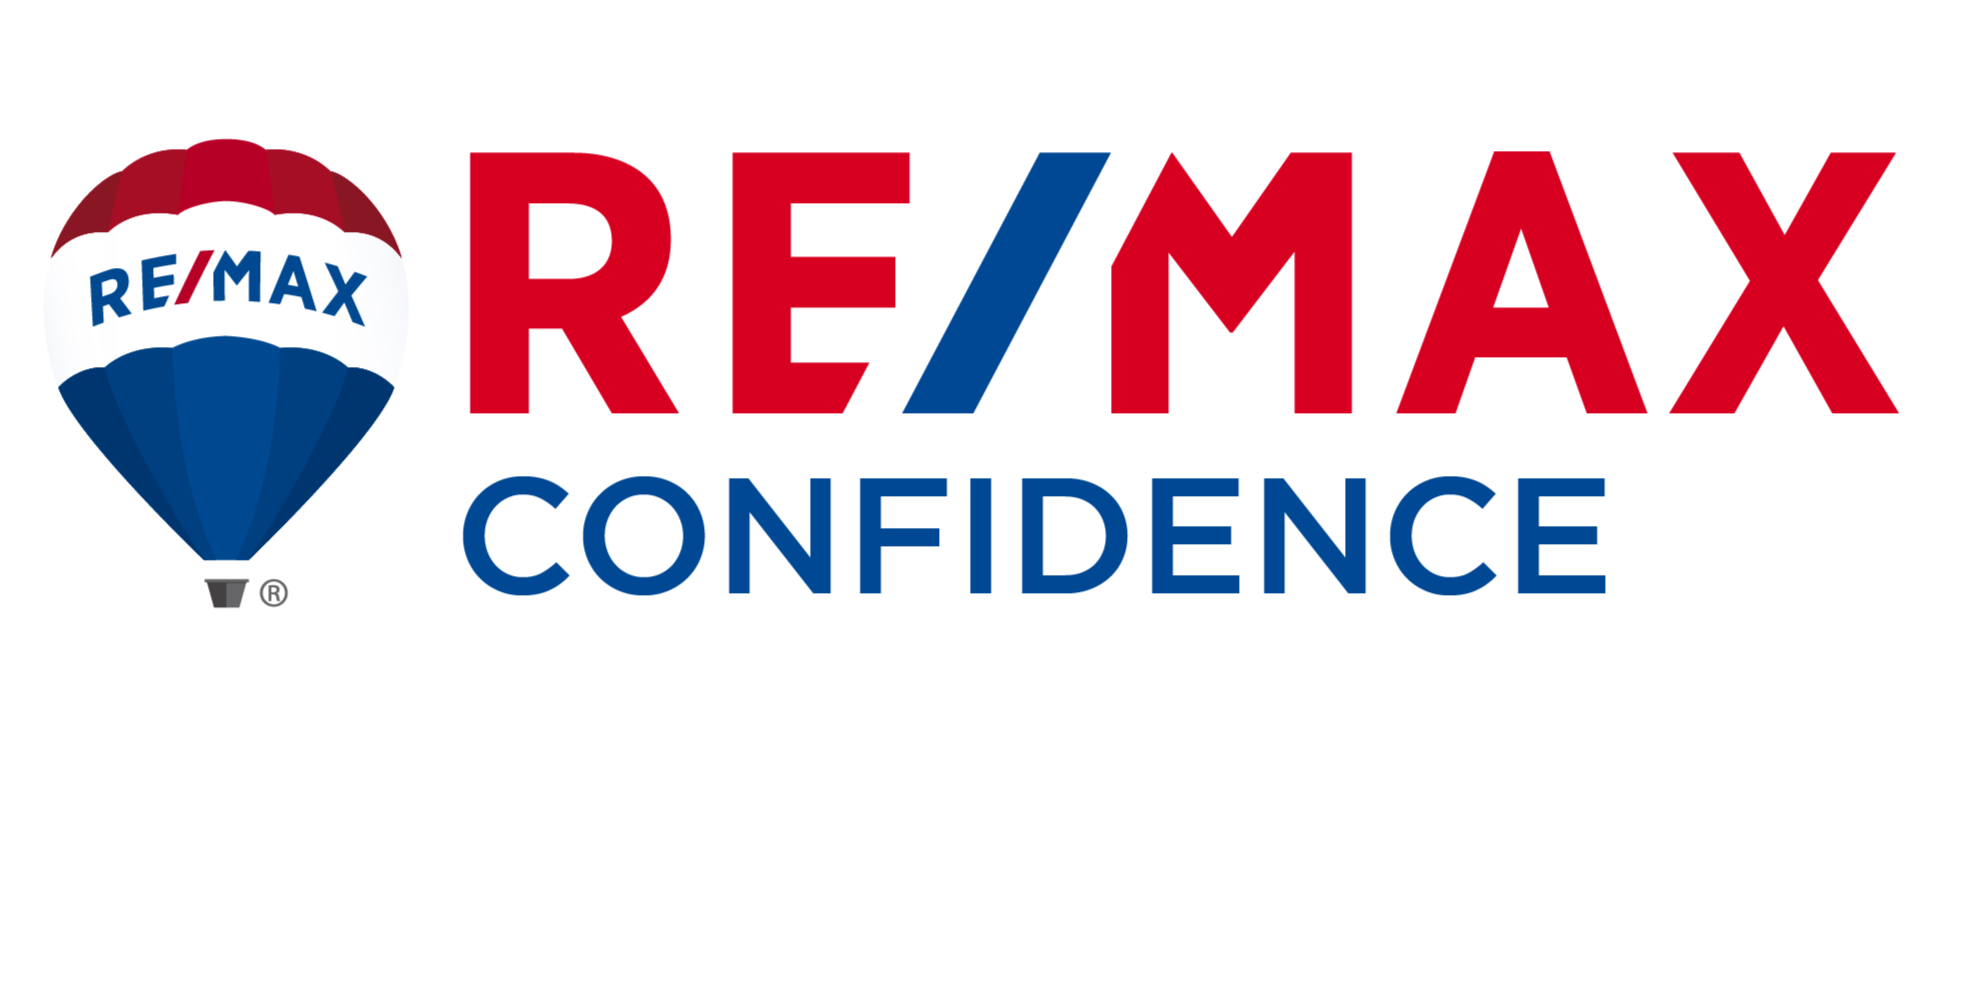 RE/MAX Confidence